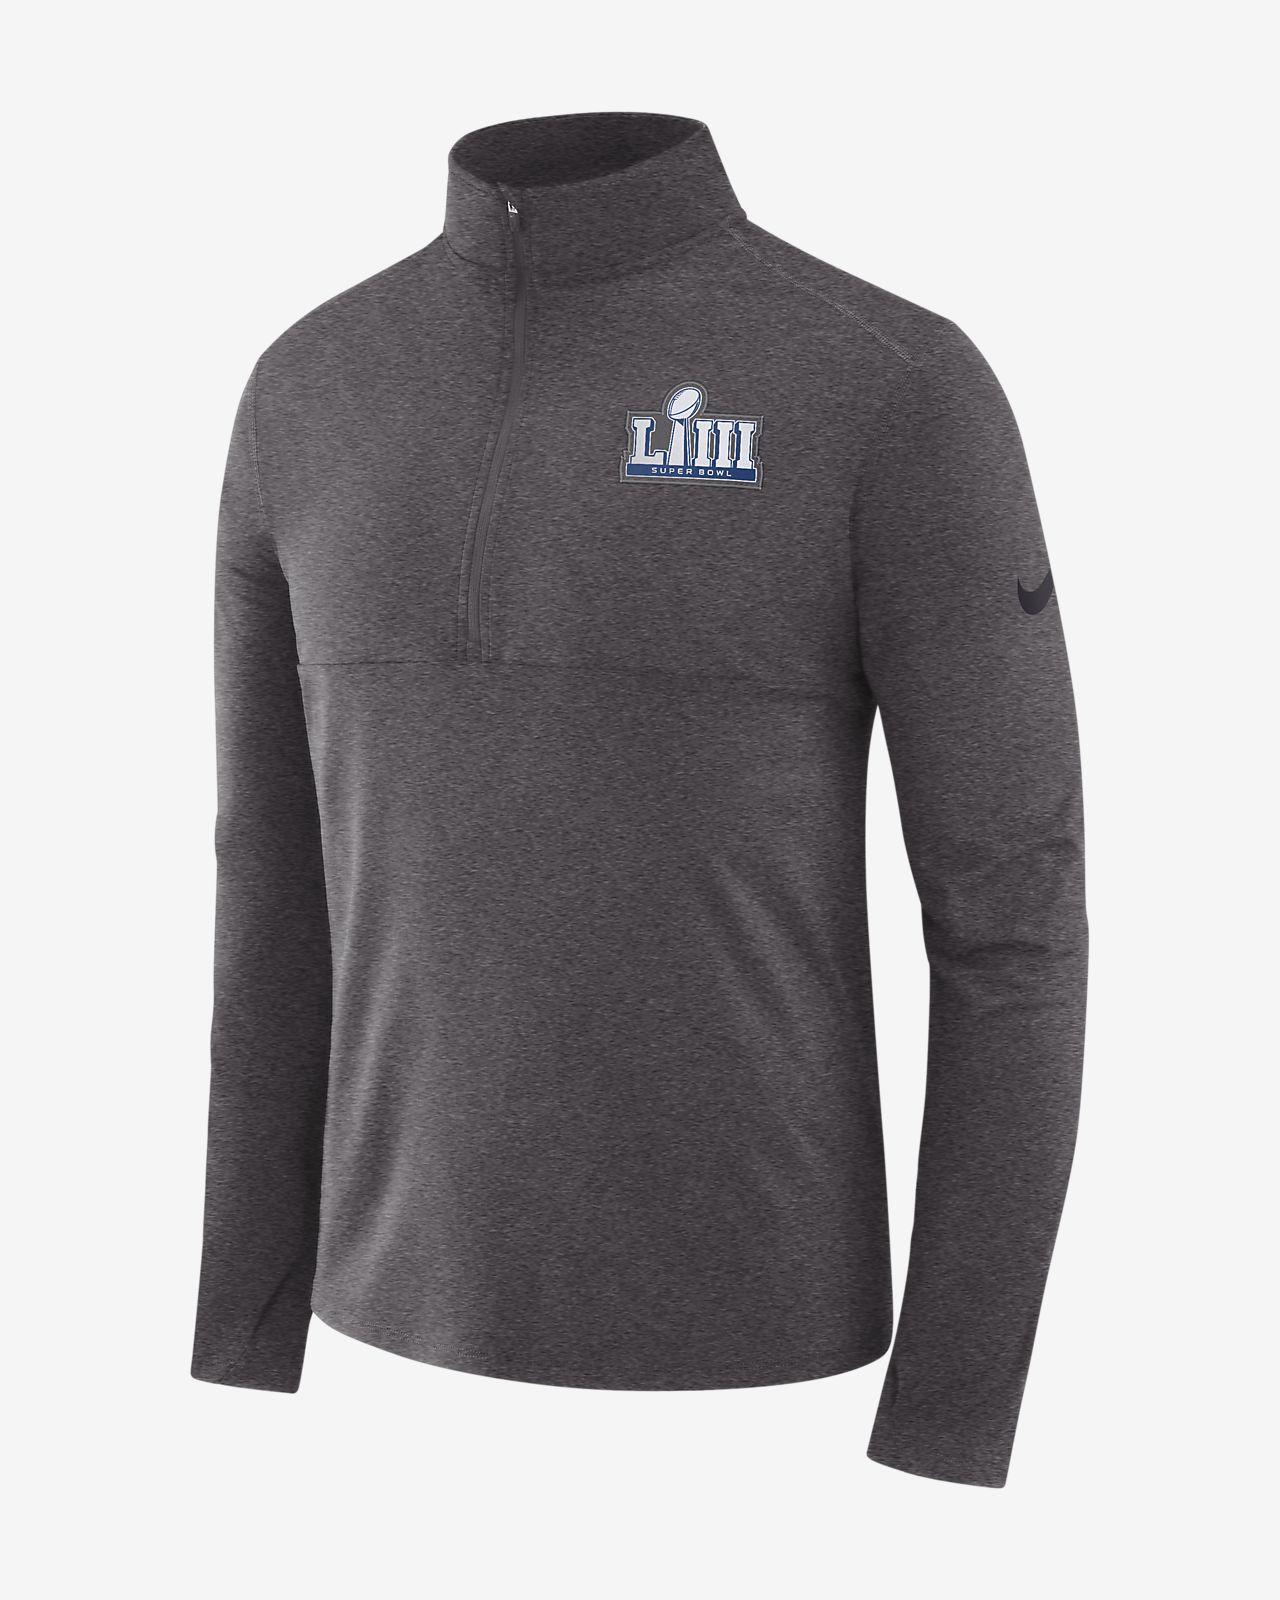 Nike Super Bowl LIII Men's Long-Sleeve 1/2-Zip Top